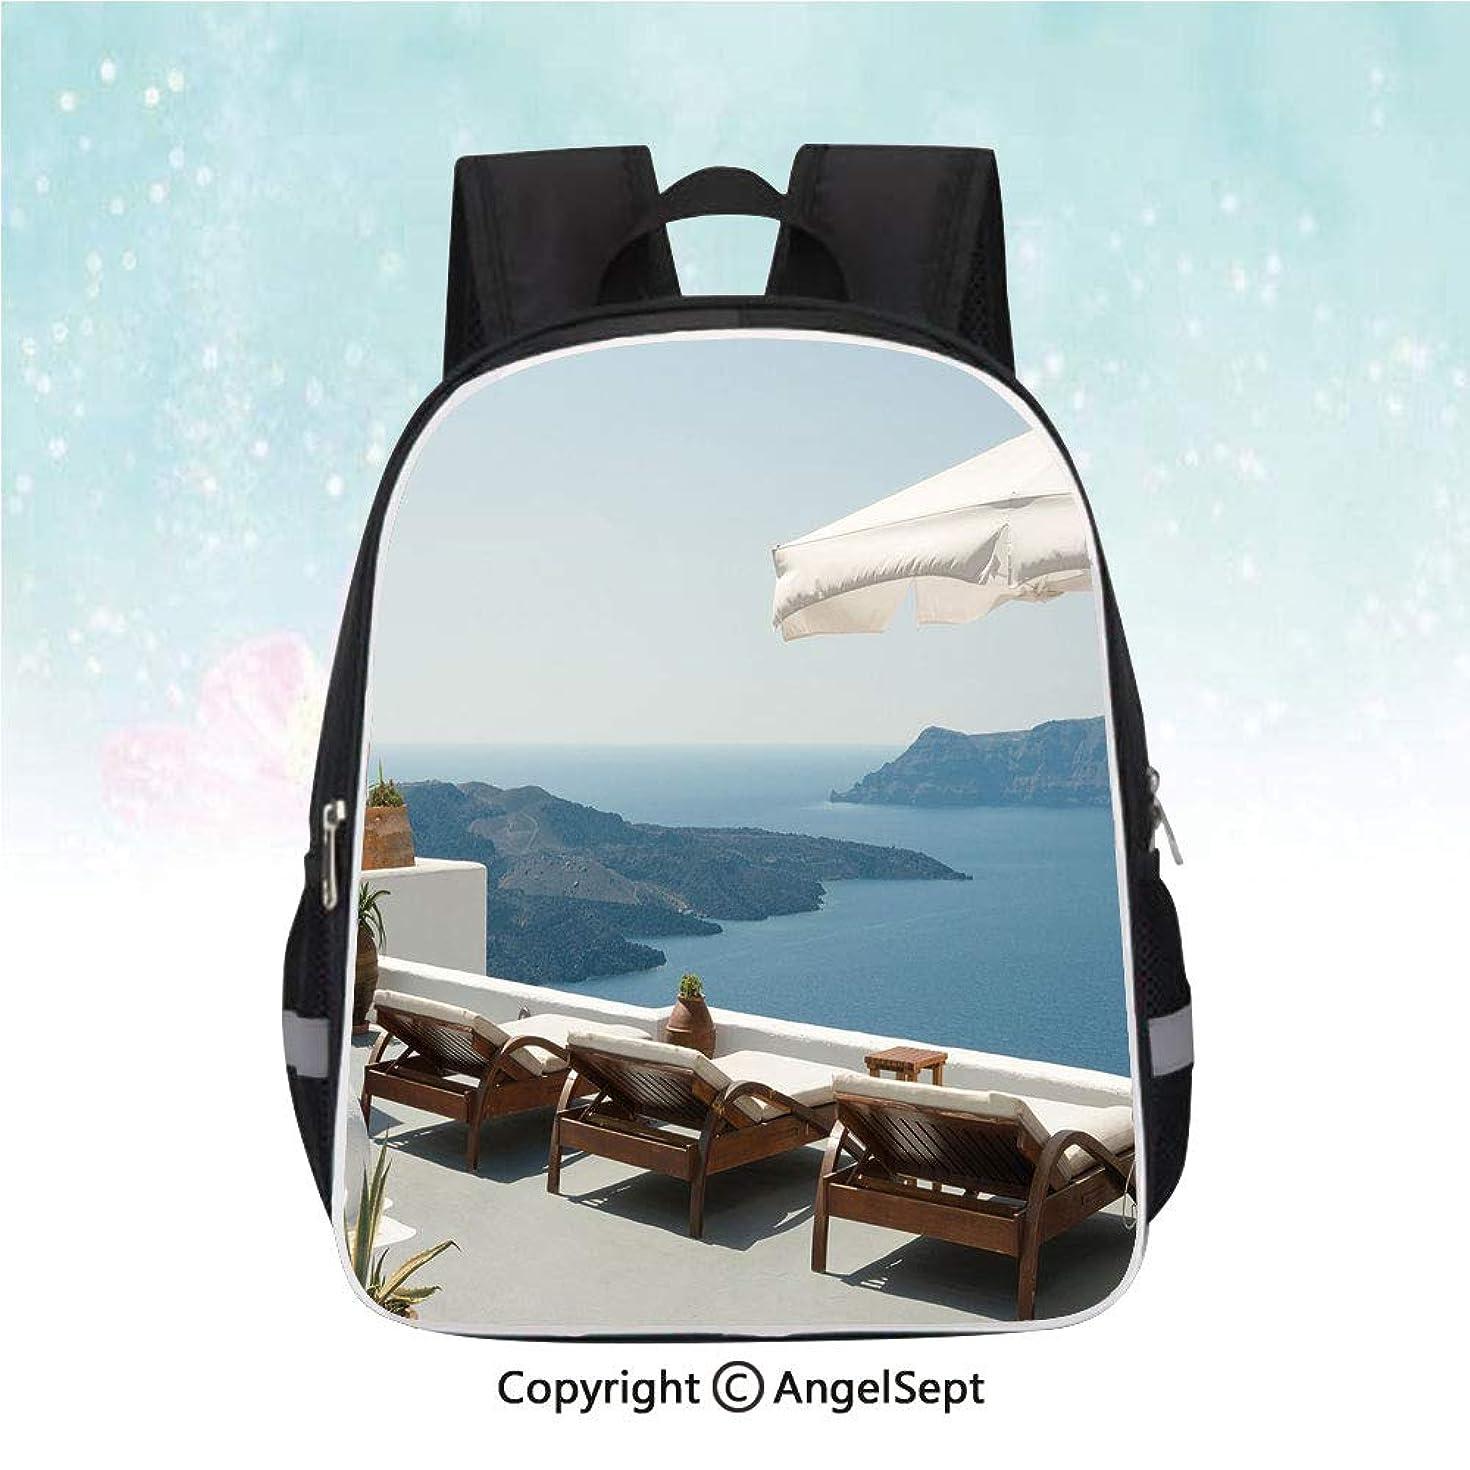 School Student Backpack,Sunbathing with Caldera View Terrace Santorini Aegean Greece Print,13